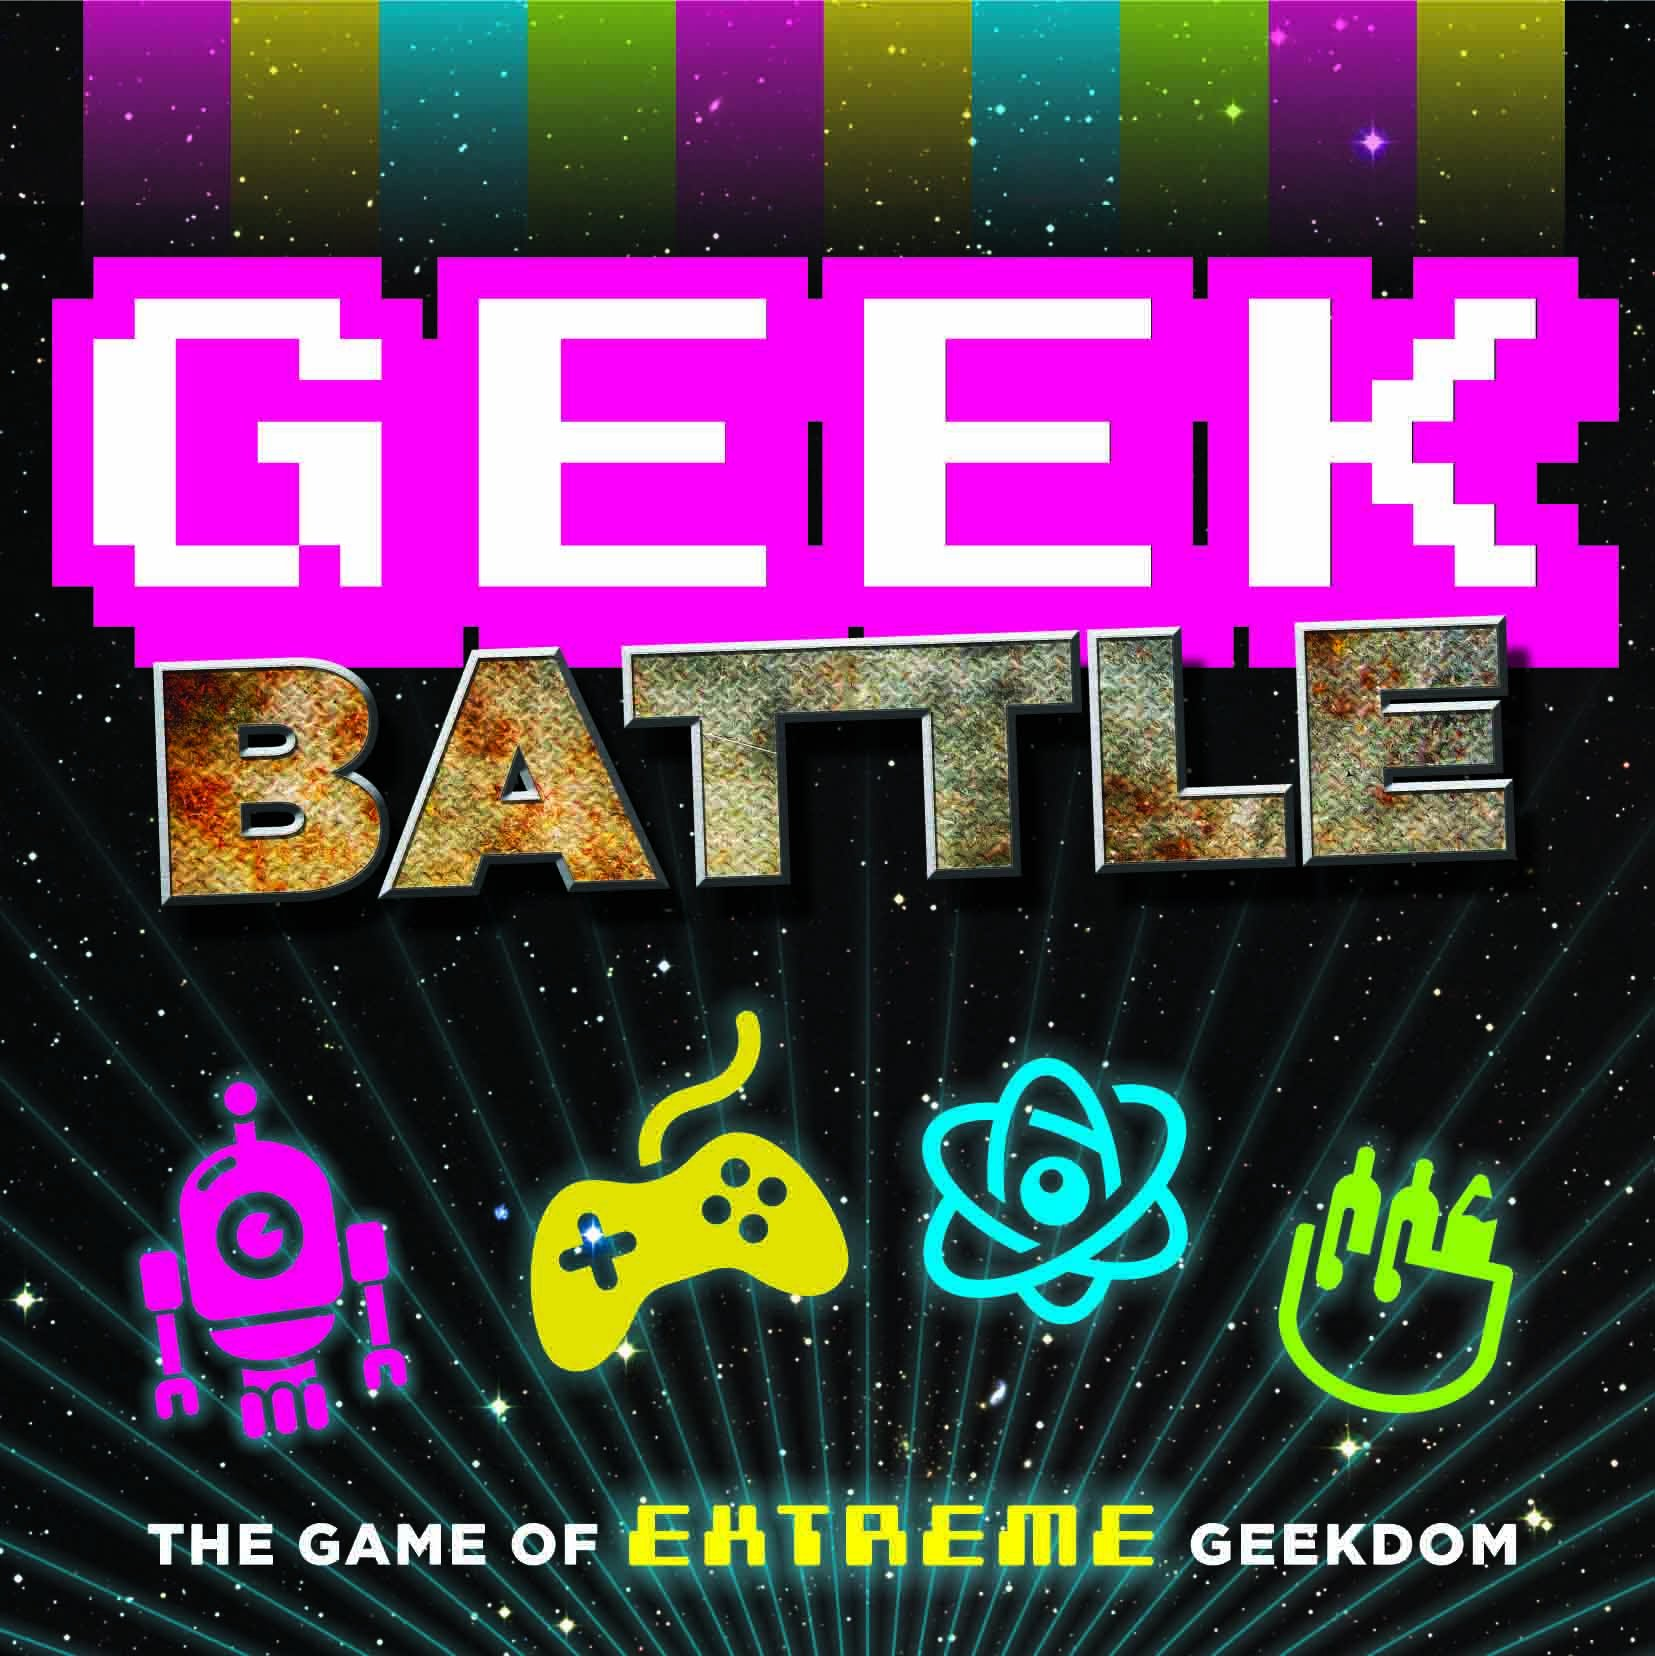 Geek Battle The Game Of Extreme Geekdom Forrest Pruzan Creative